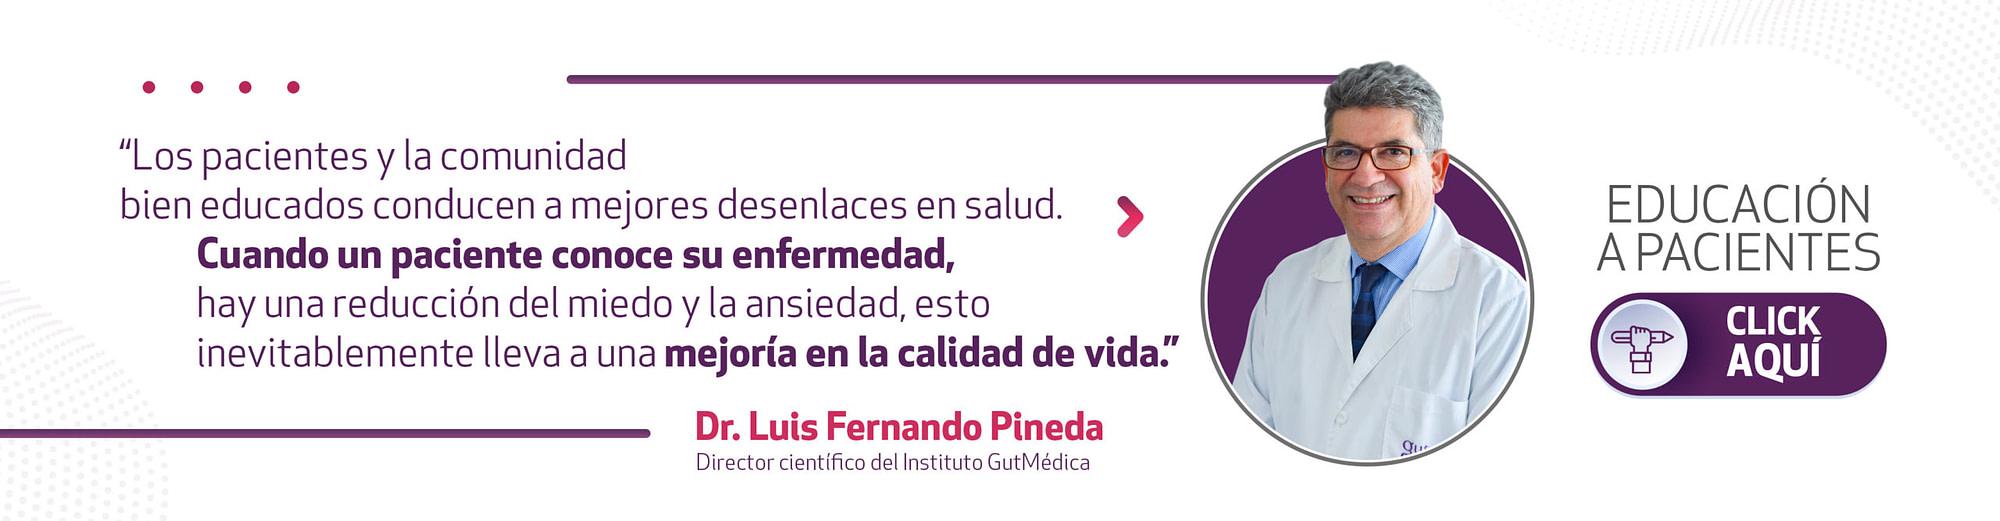 Dr-Luis-Fernando-Pineda-Gutmedica-bogota